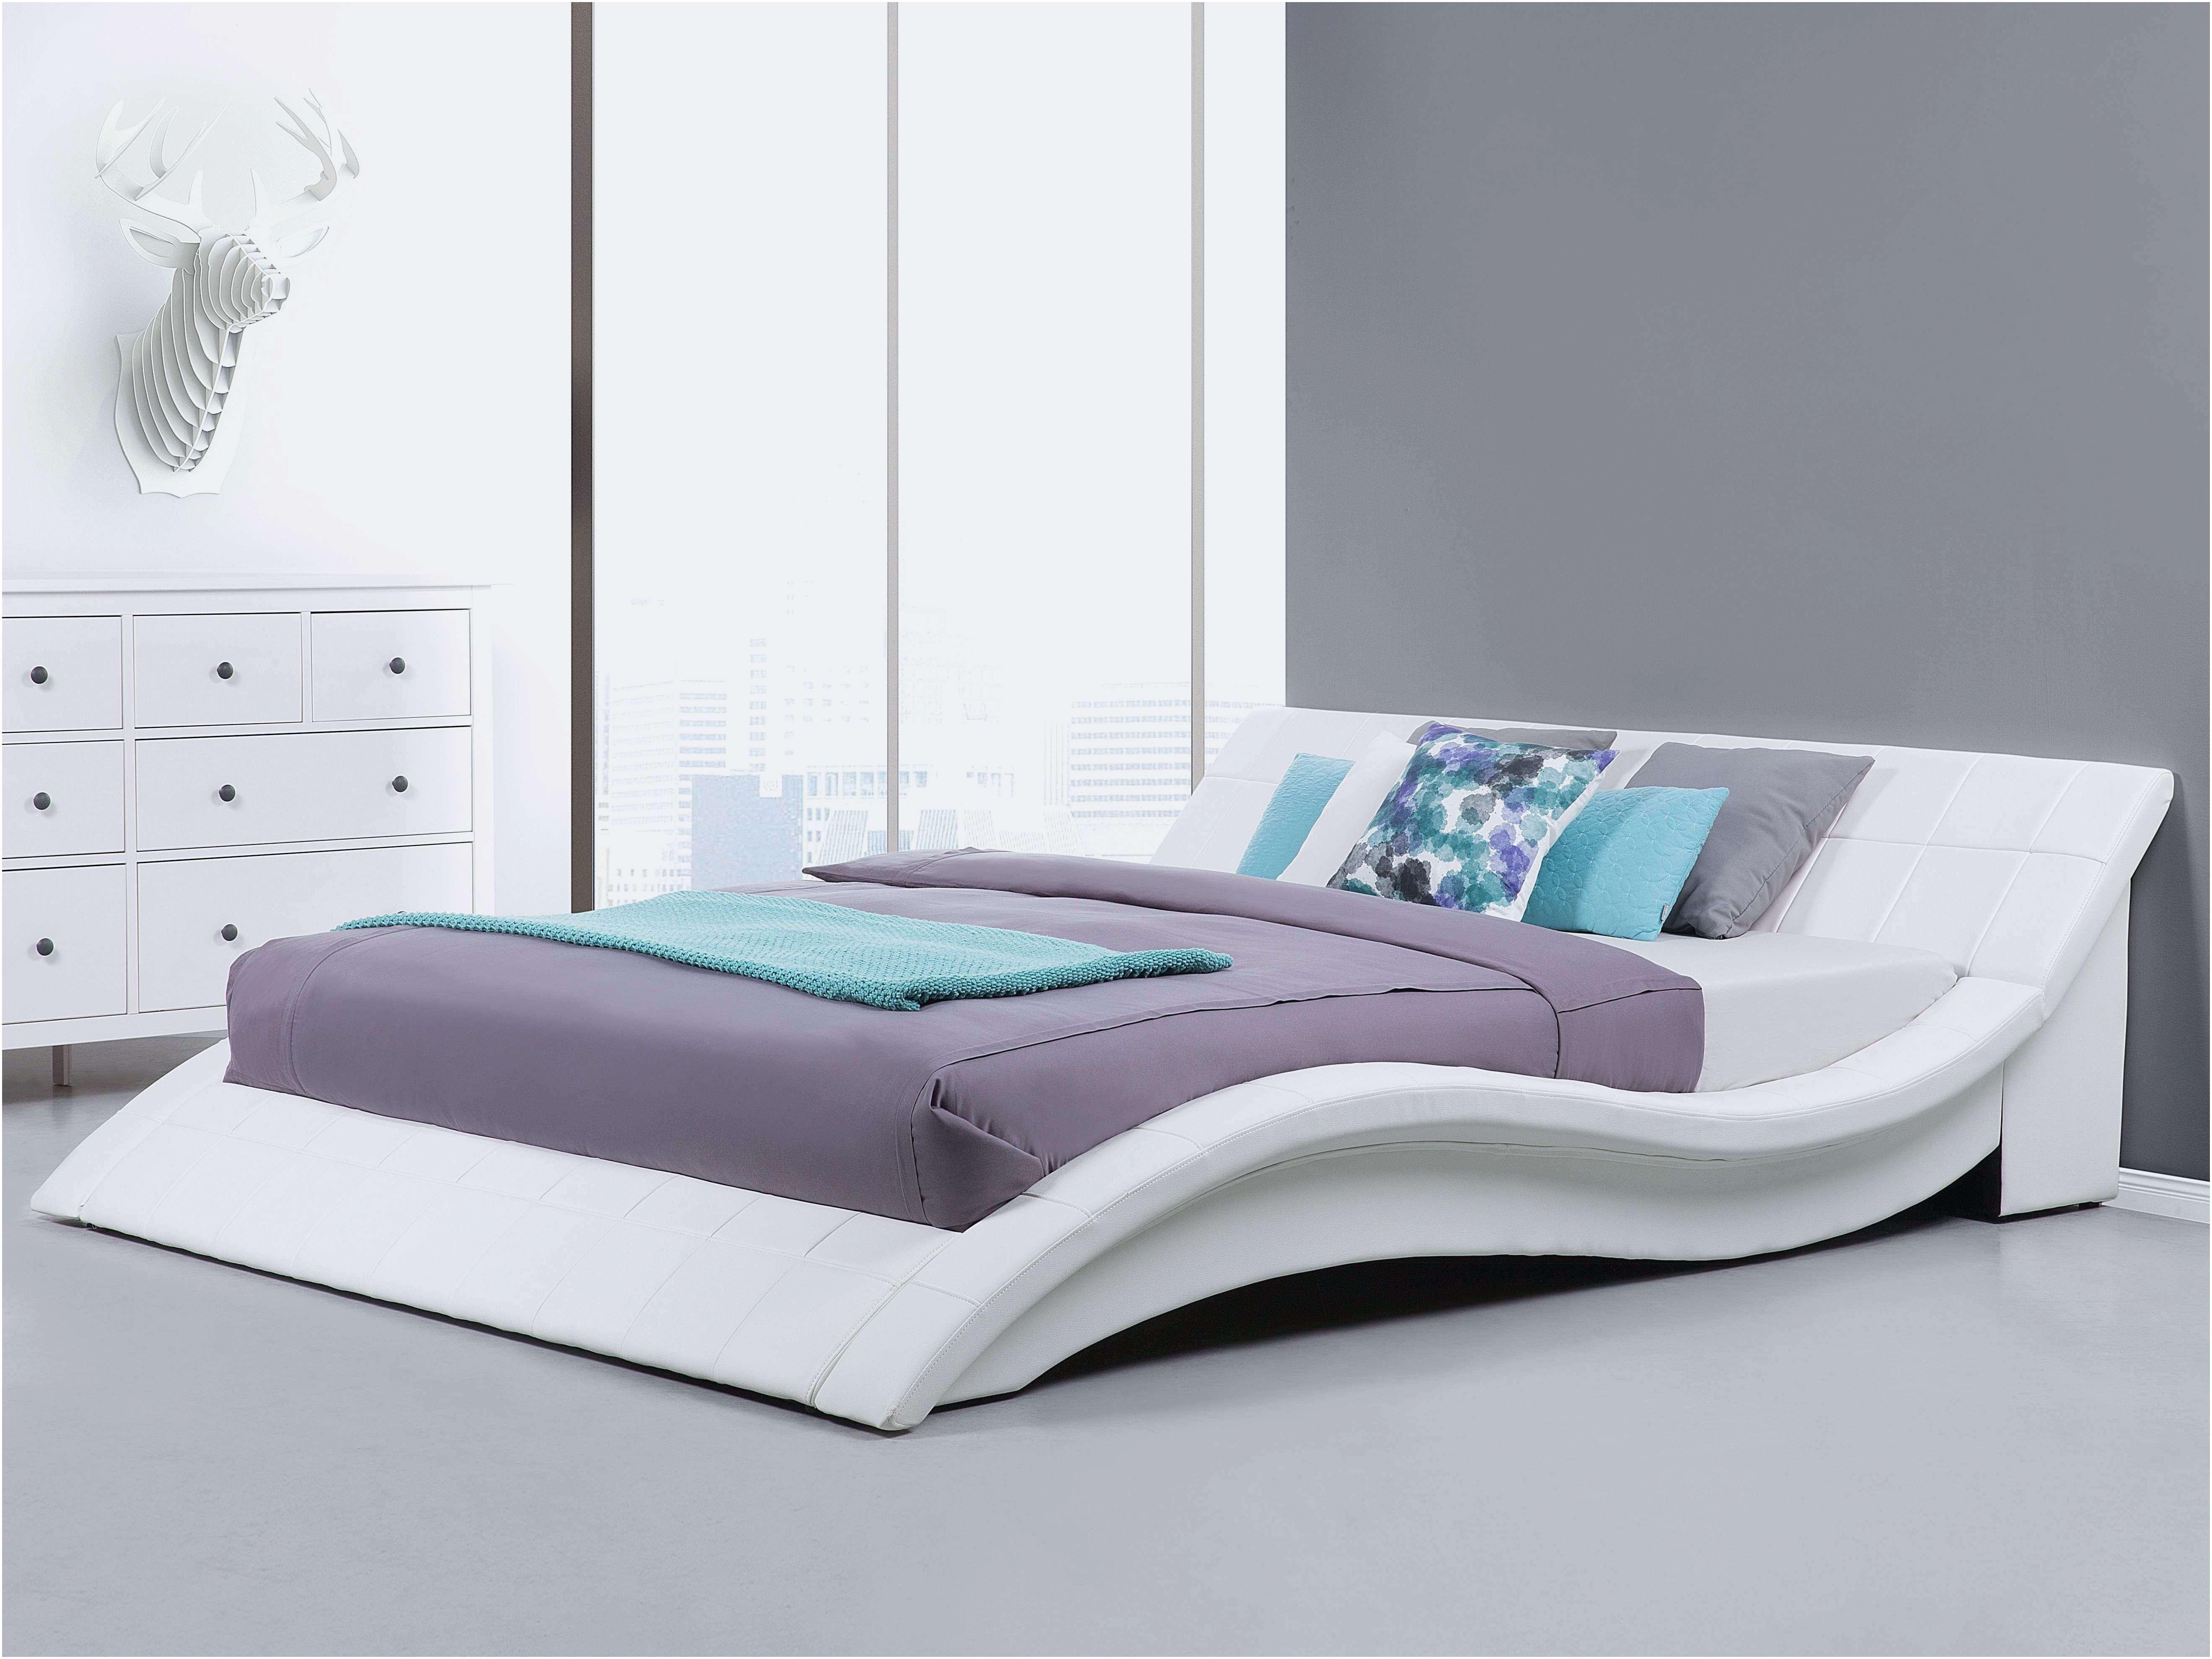 frais ikea topdek inspirerende ikea matratzen garantie mit modisch 12 zoll pour excellent futon ikea